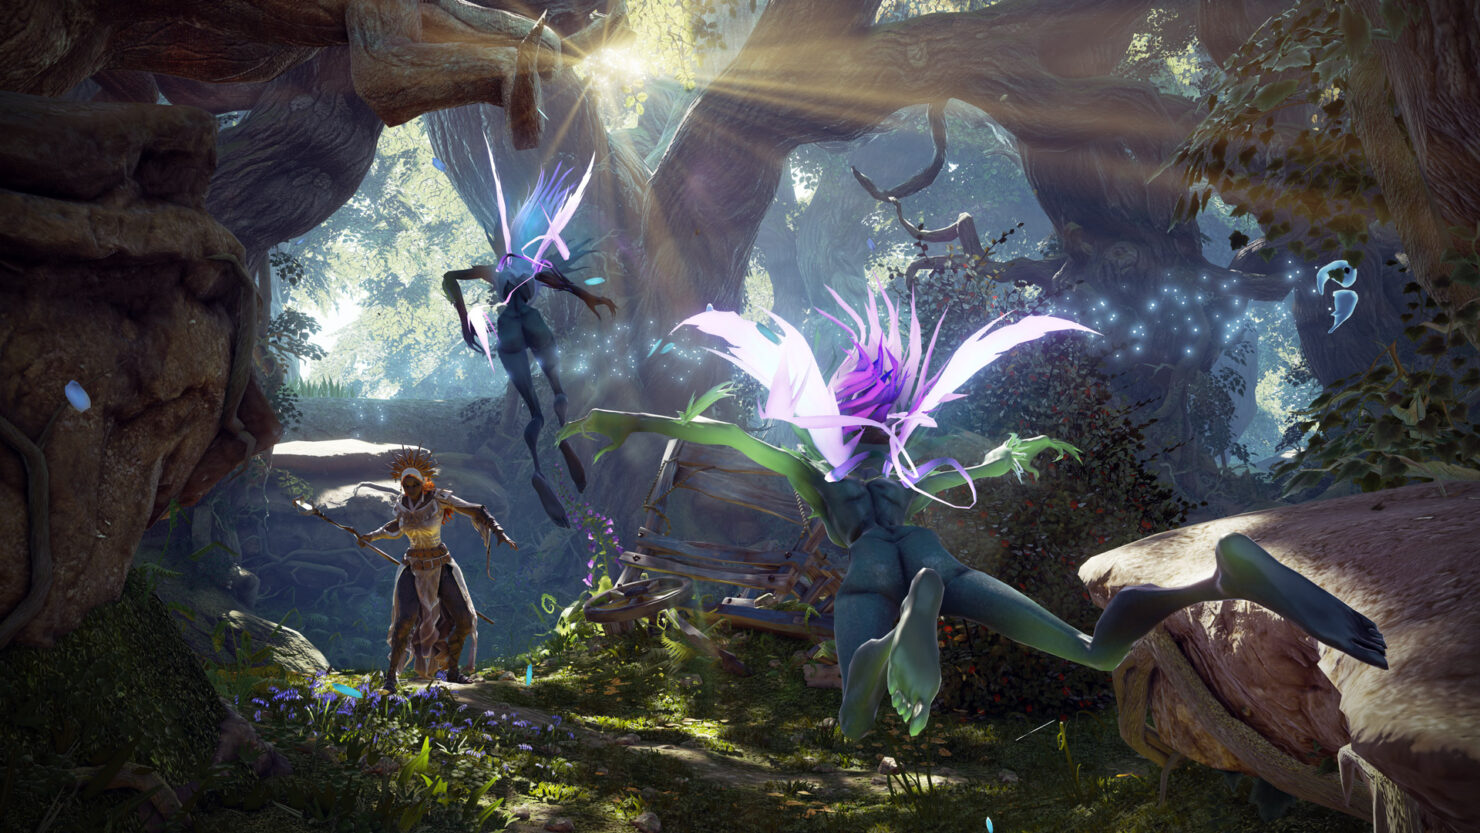 fable-legends-gamescom-2015-celeste-nymphs-jpg